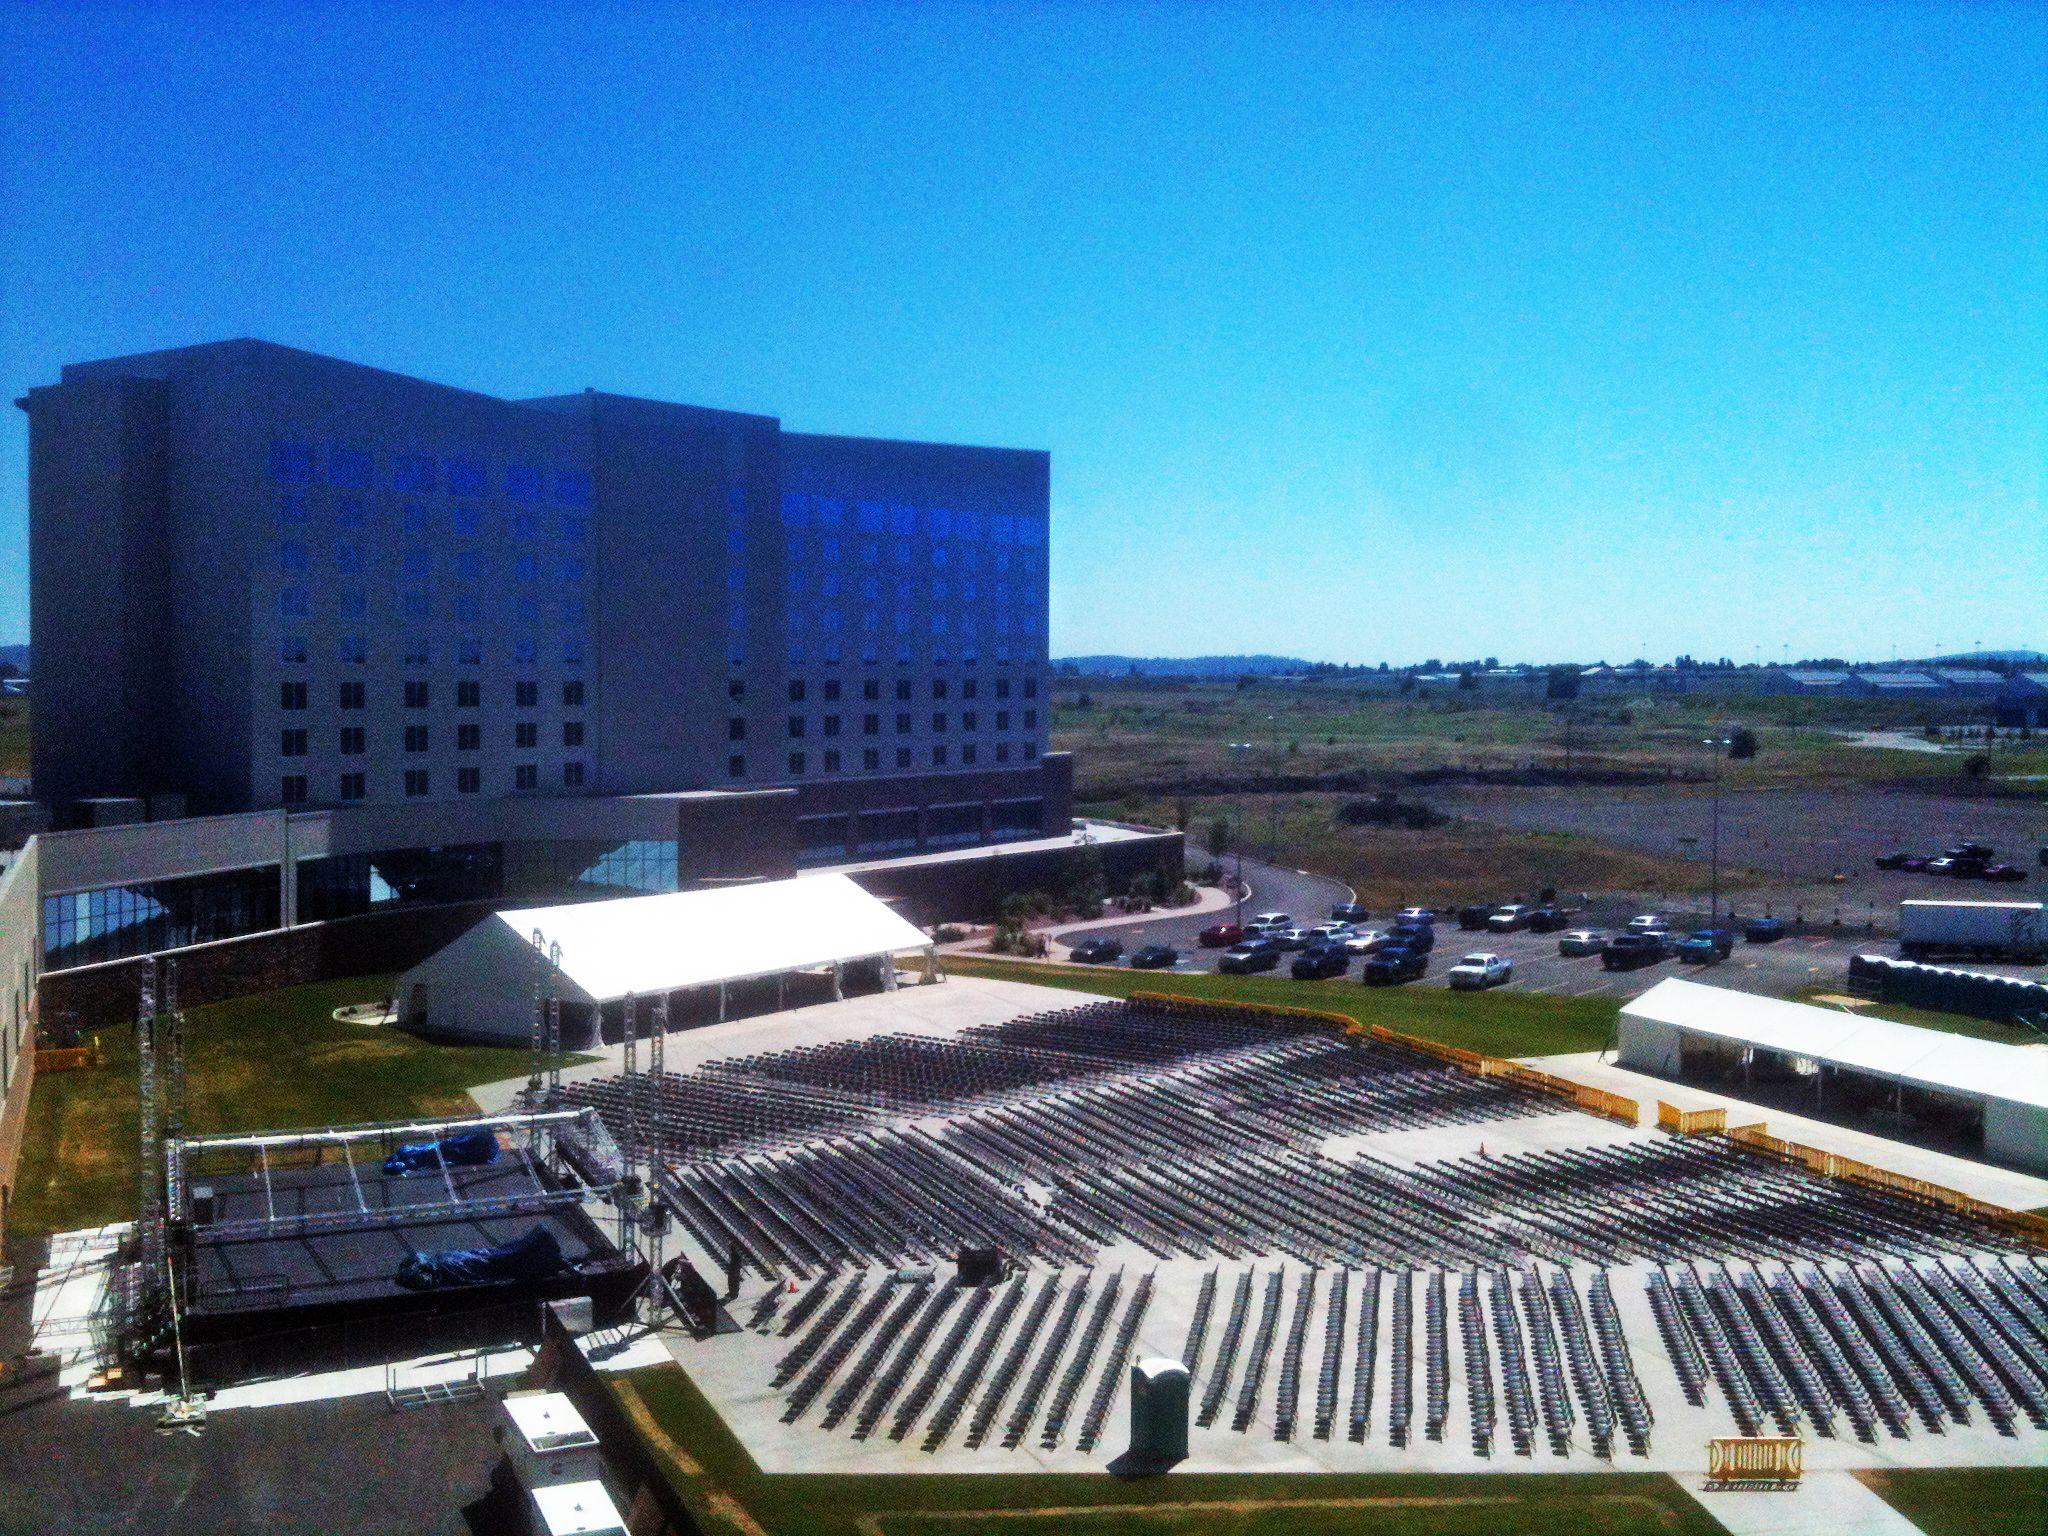 Northwest casino spokane soaring eagle casino upcoming hairshows